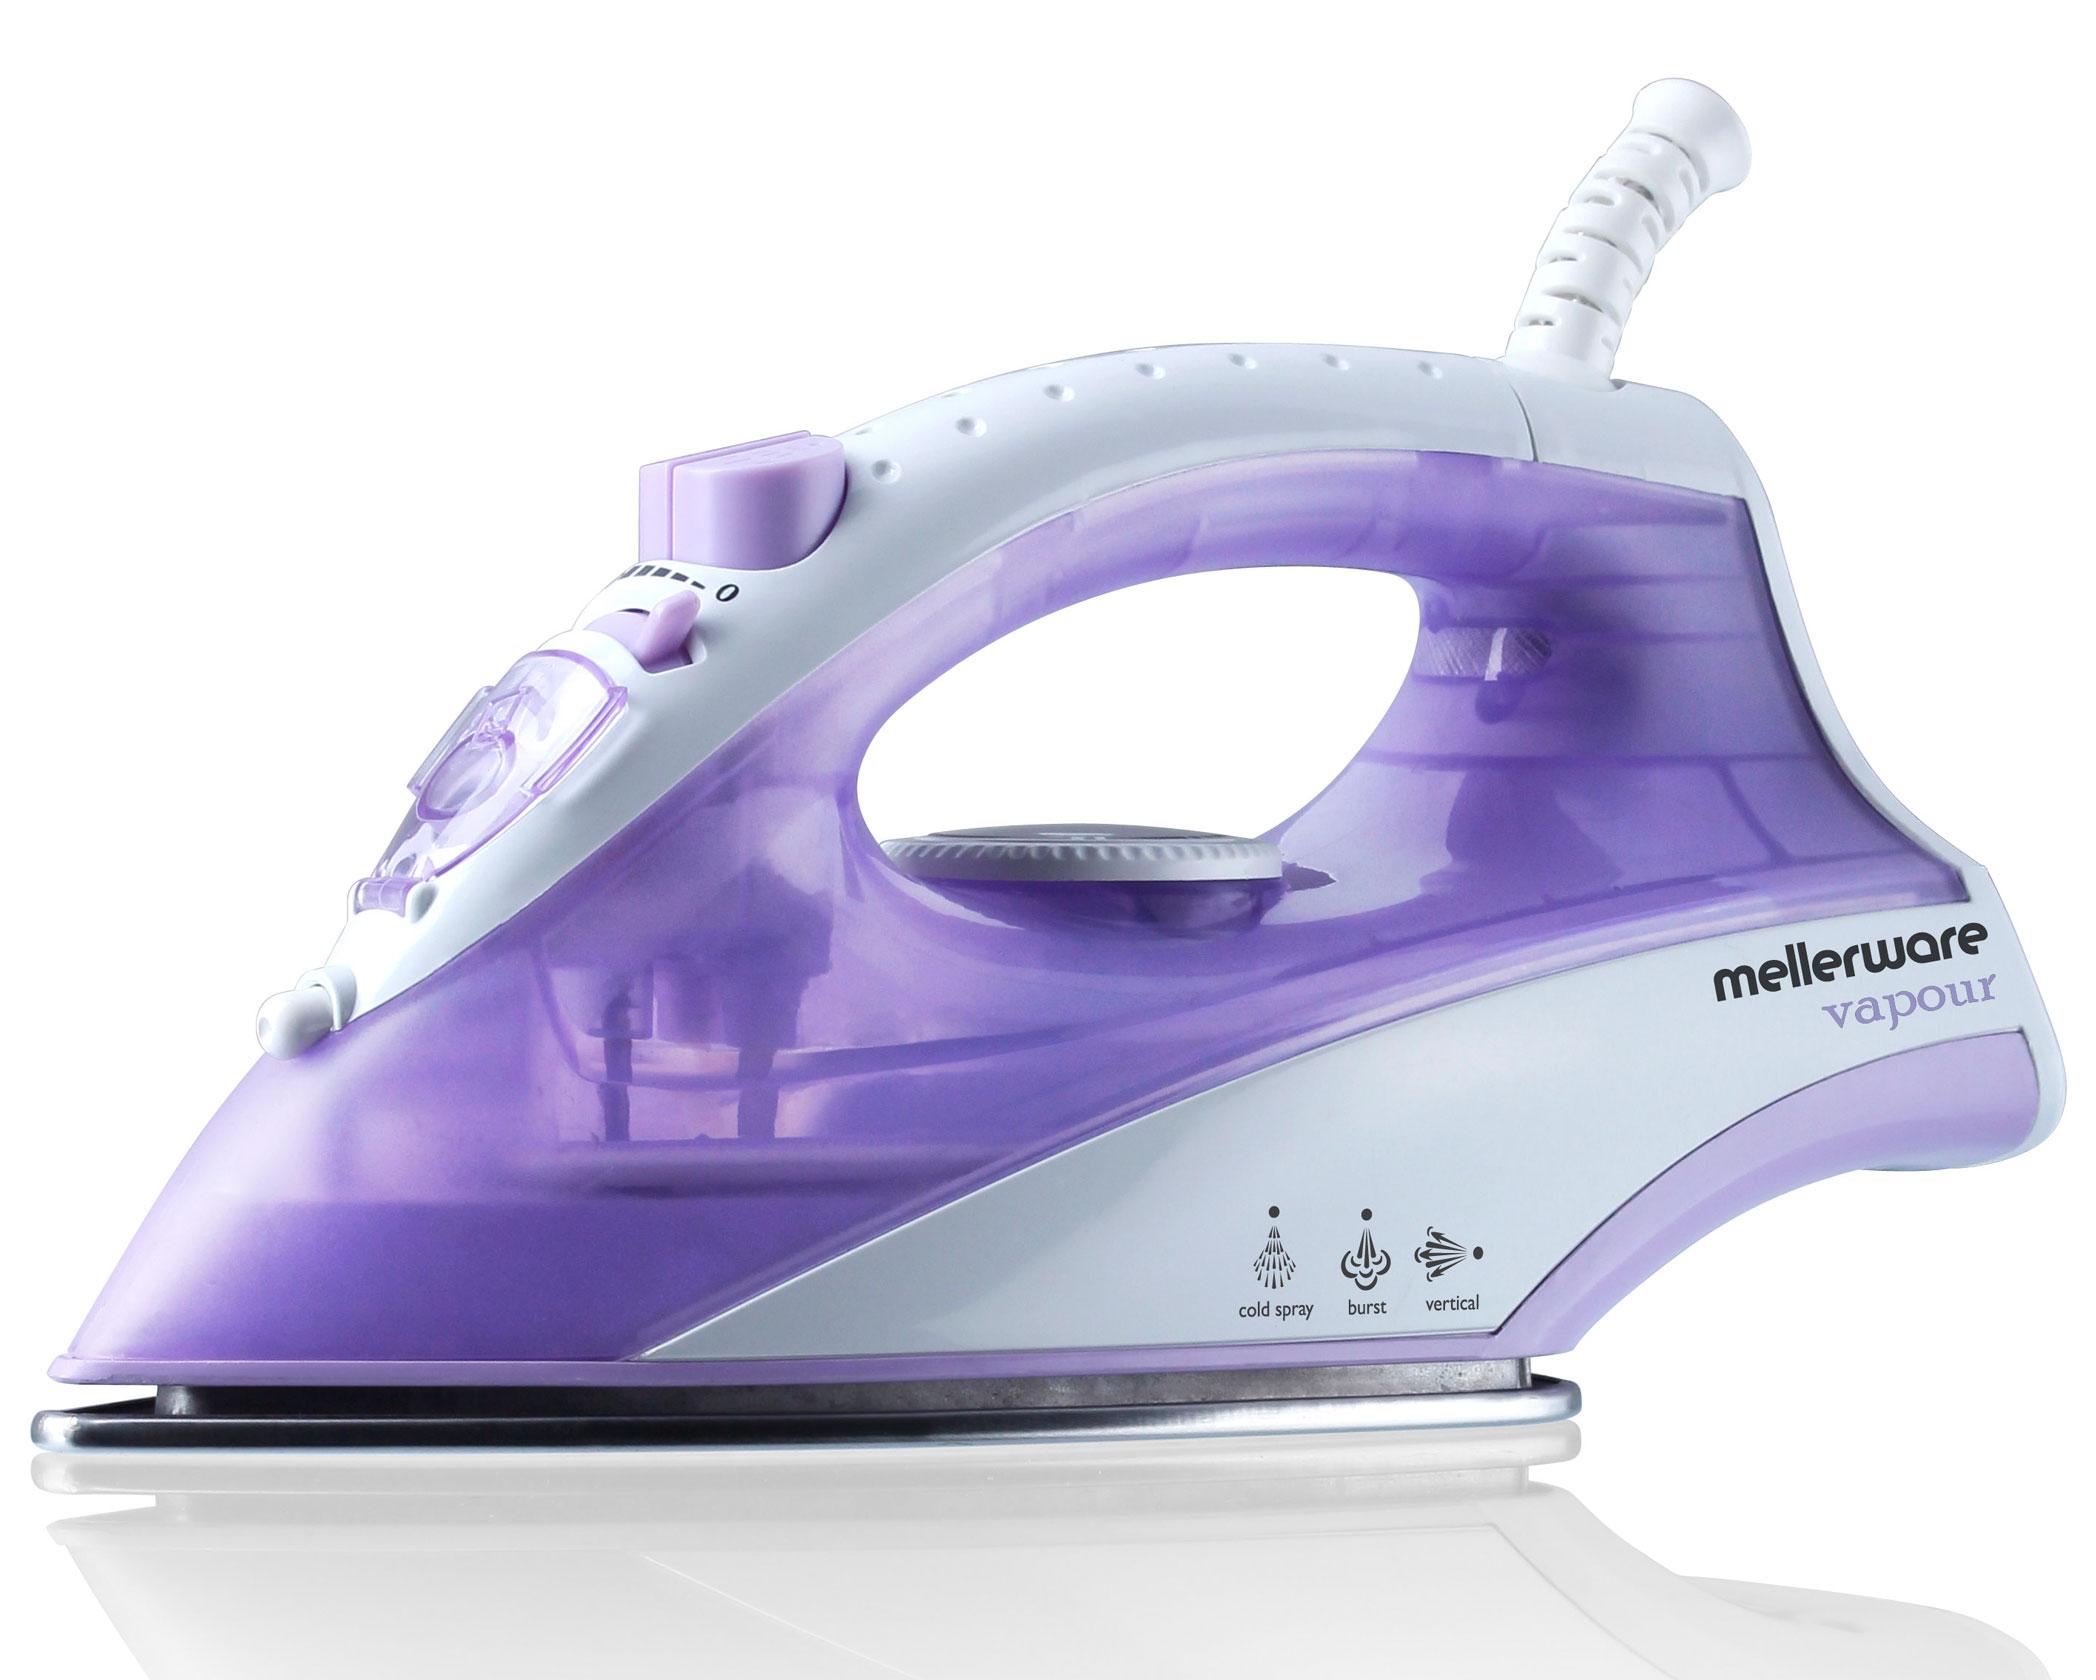 vapour-steam-iron-23140-large-1